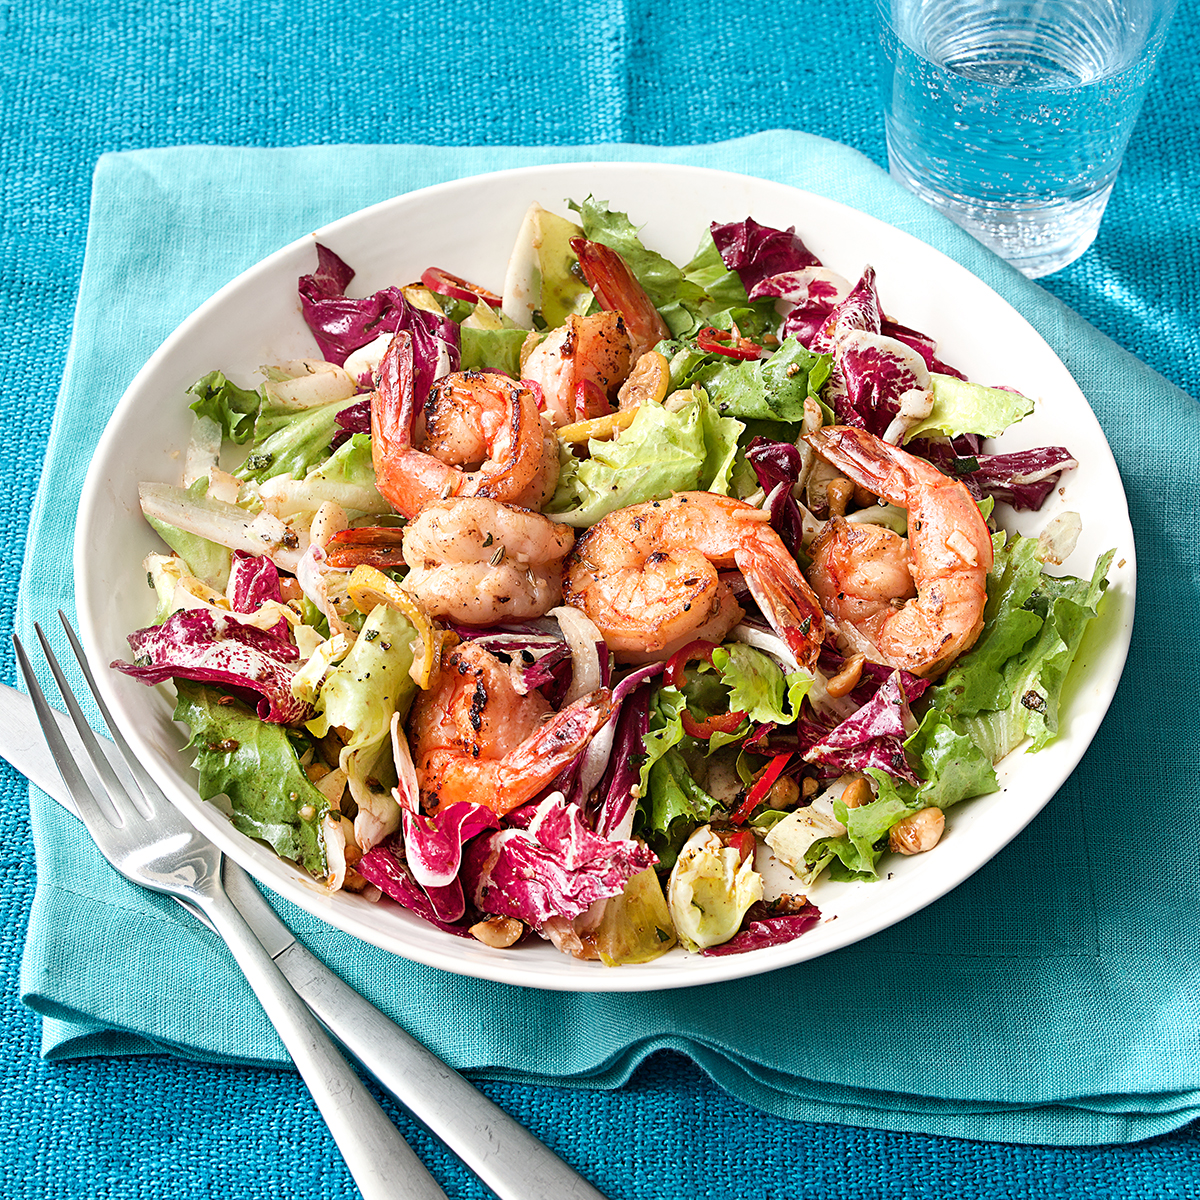 tri-color salad hazelnuts sauteed shrimp